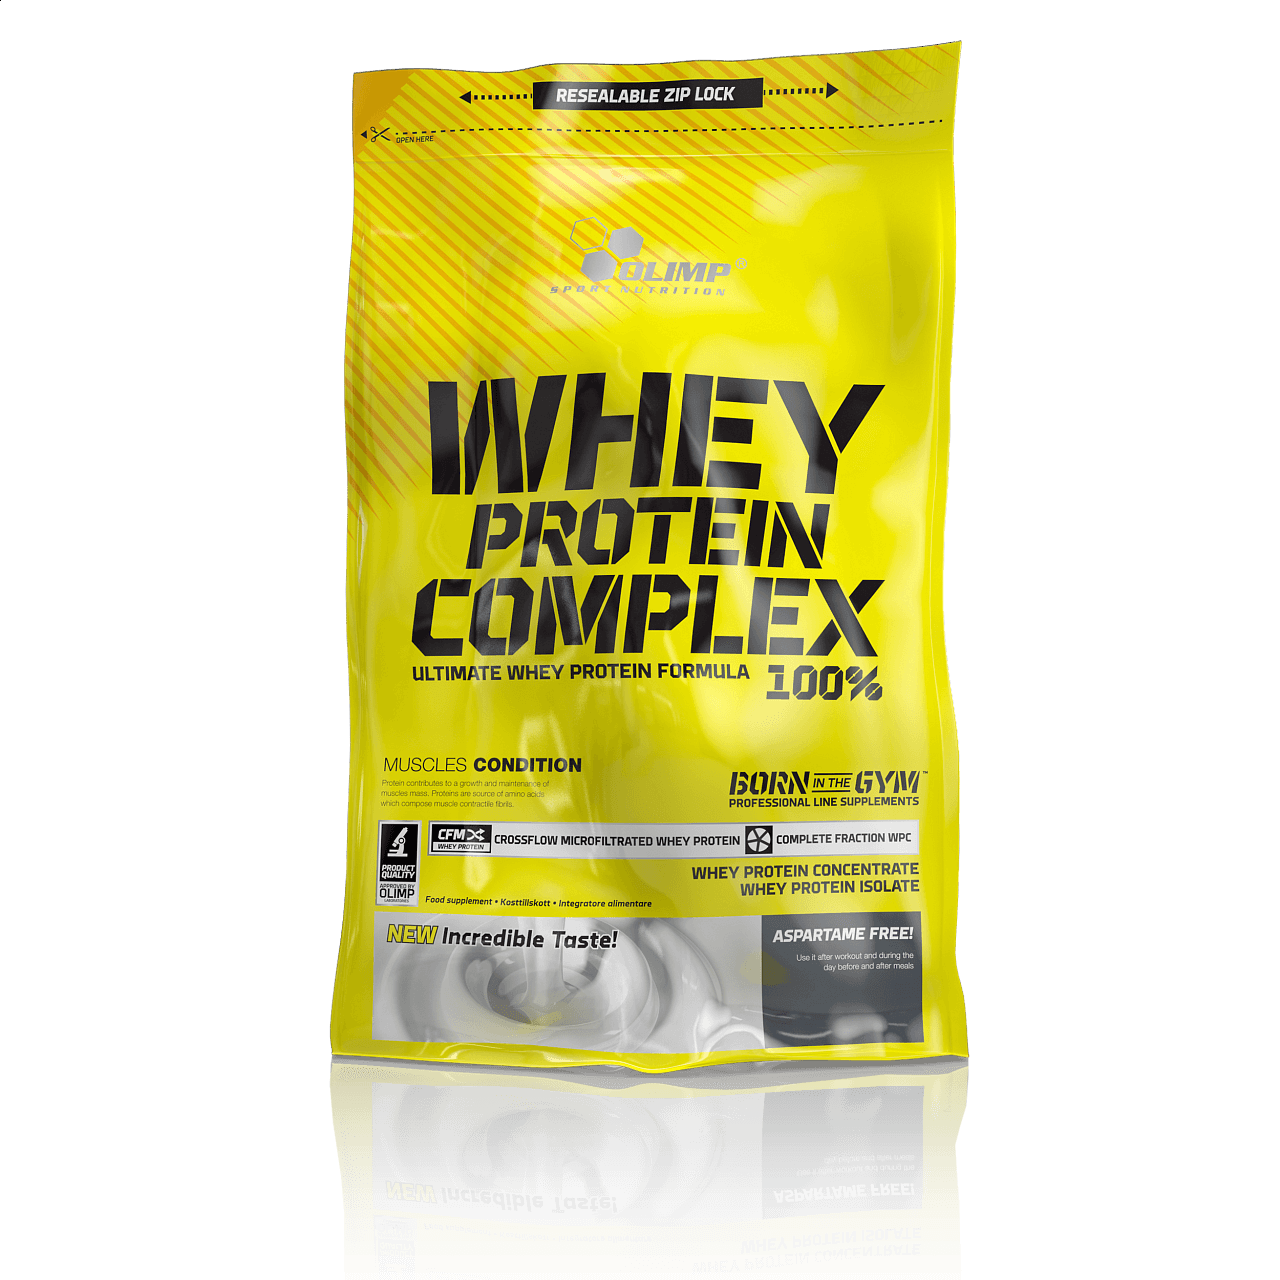 Proteiny - bílkoviny Olimp Whey Protein Complex 100%, 700g